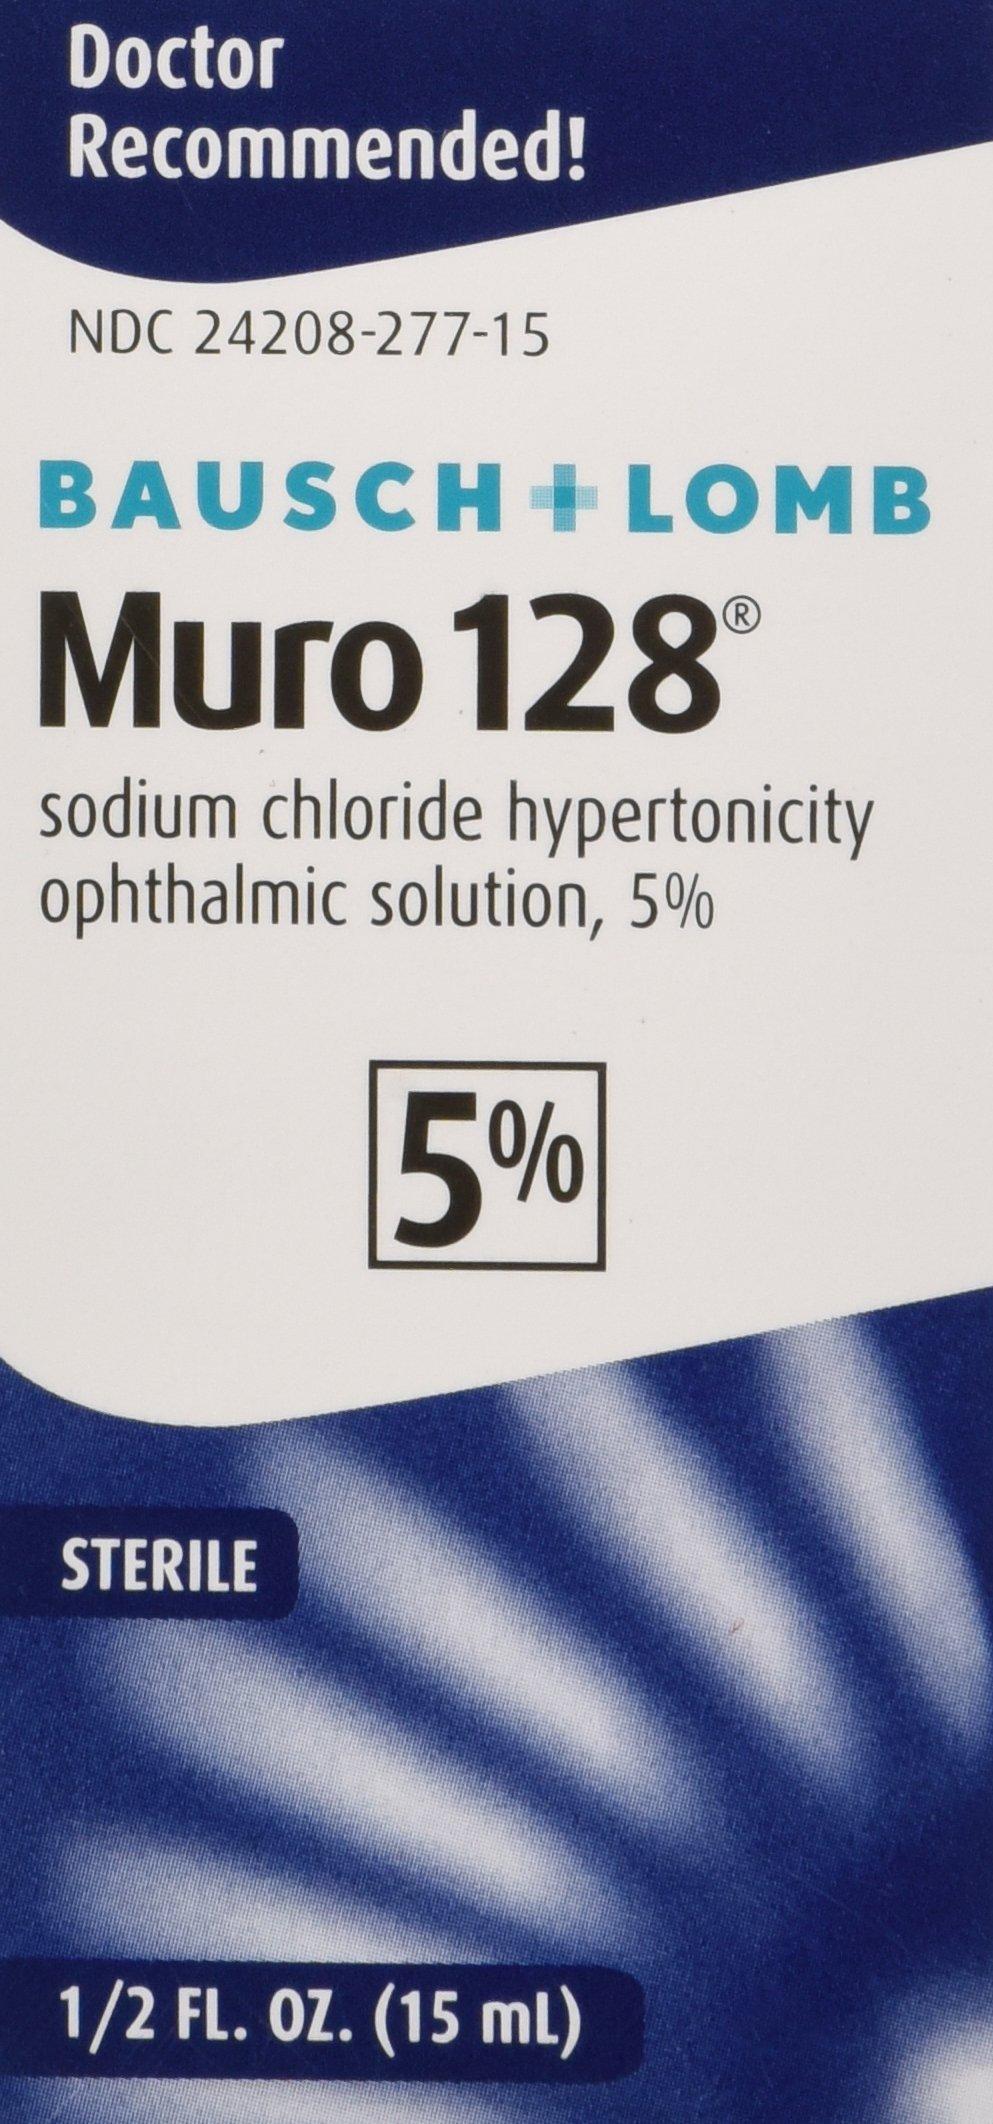 Bausch & Lomb Pharmaceuticals Muro 128, 5 Percent Solution, (15 mL), 0.5 oz.